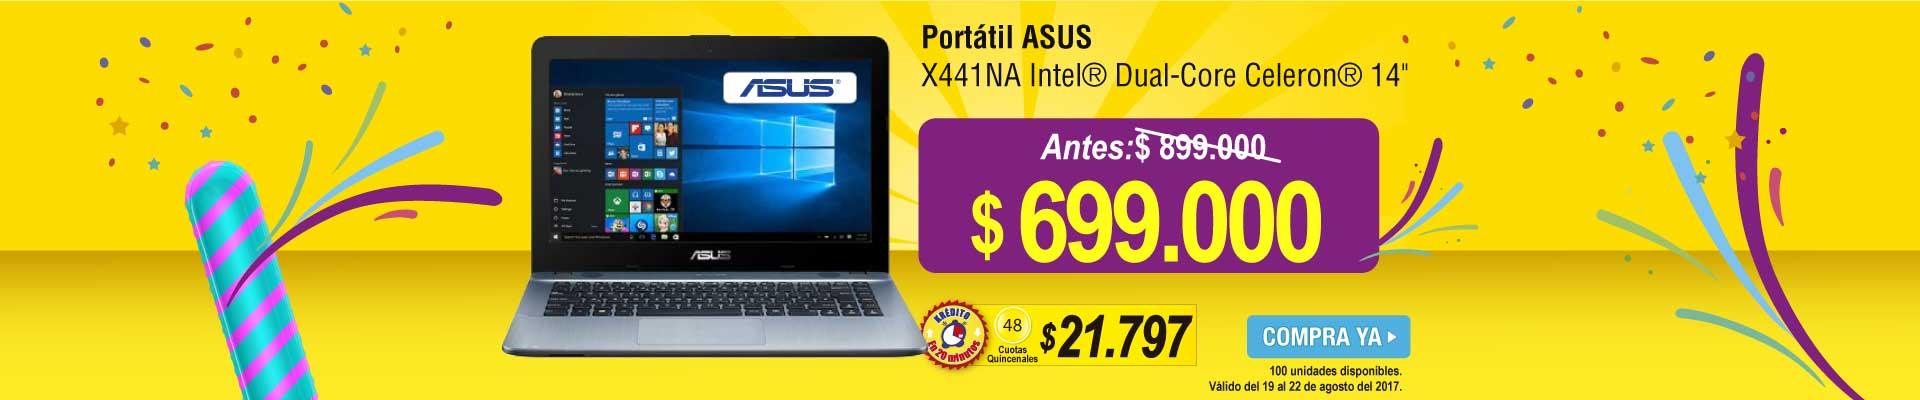 Portátil ASUS - X441NA - Intel® Dual-Core Celeron® - informatica